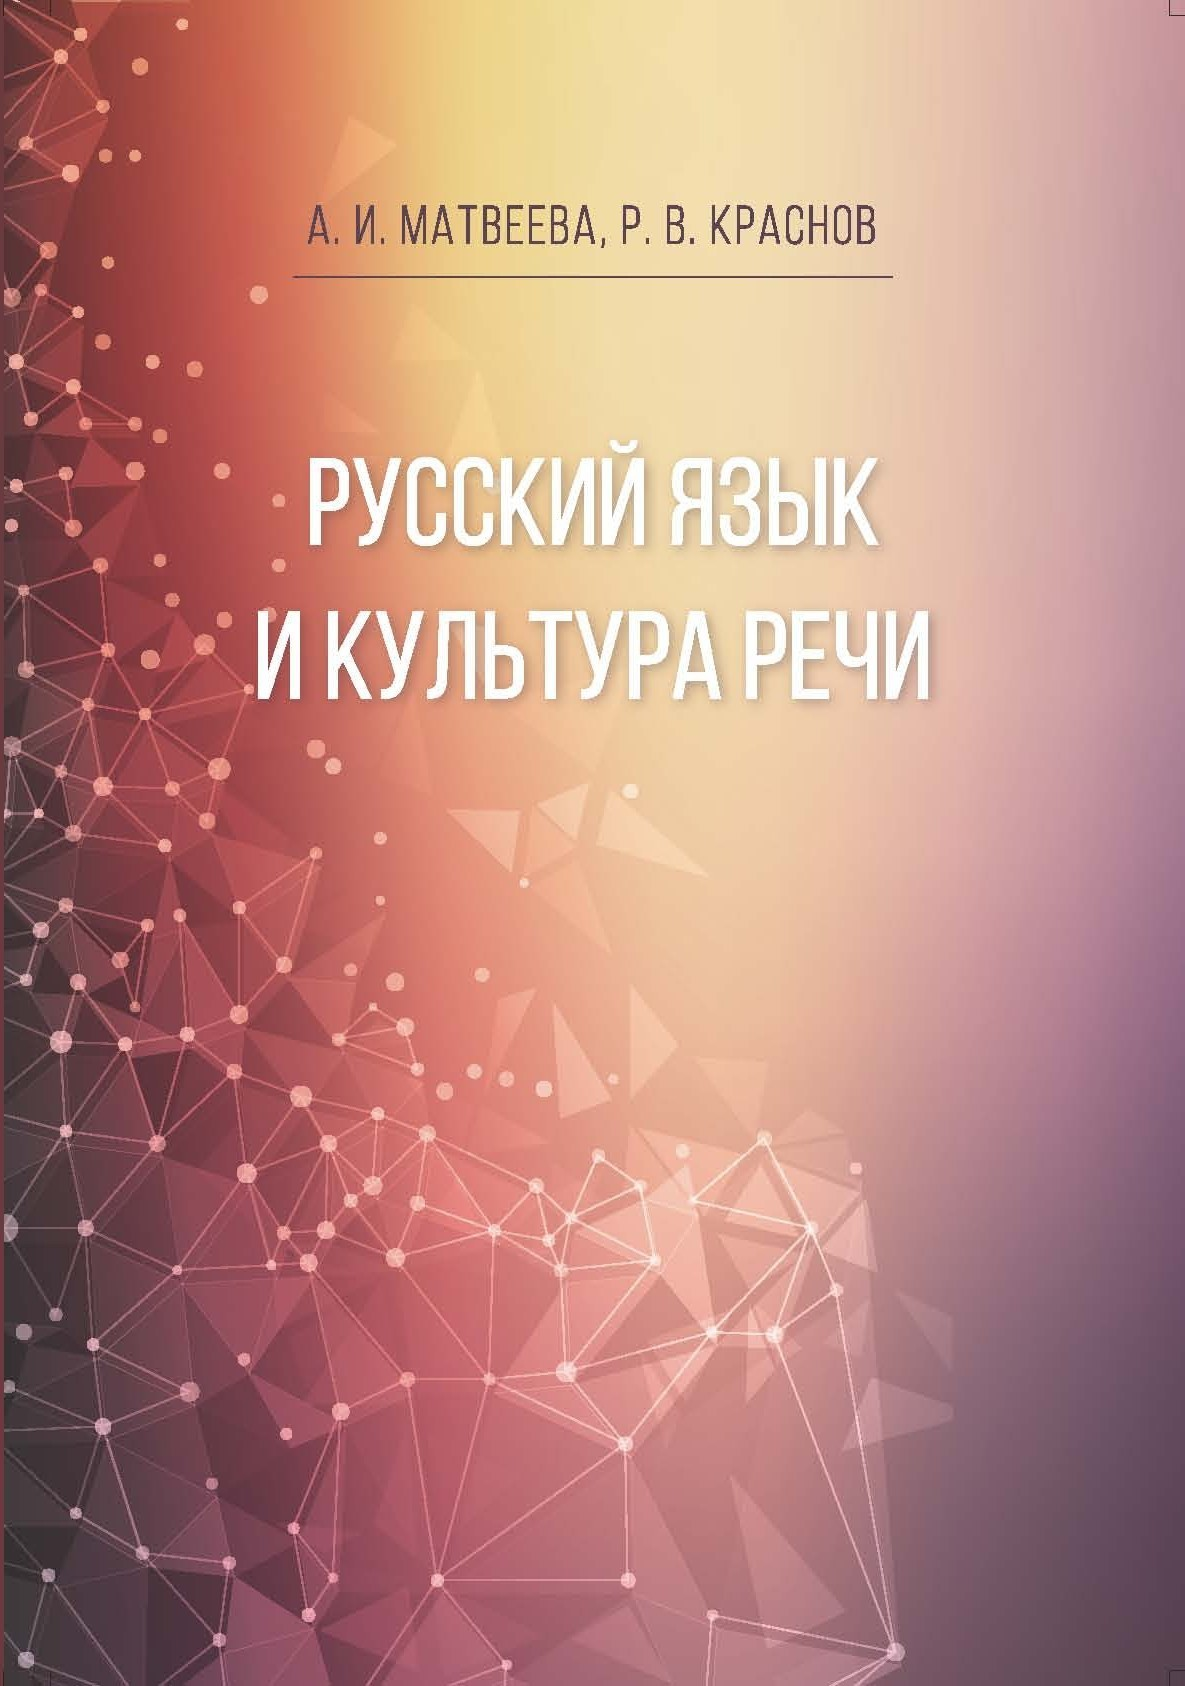 А. И. Матвеева. Русский язык и культура речи